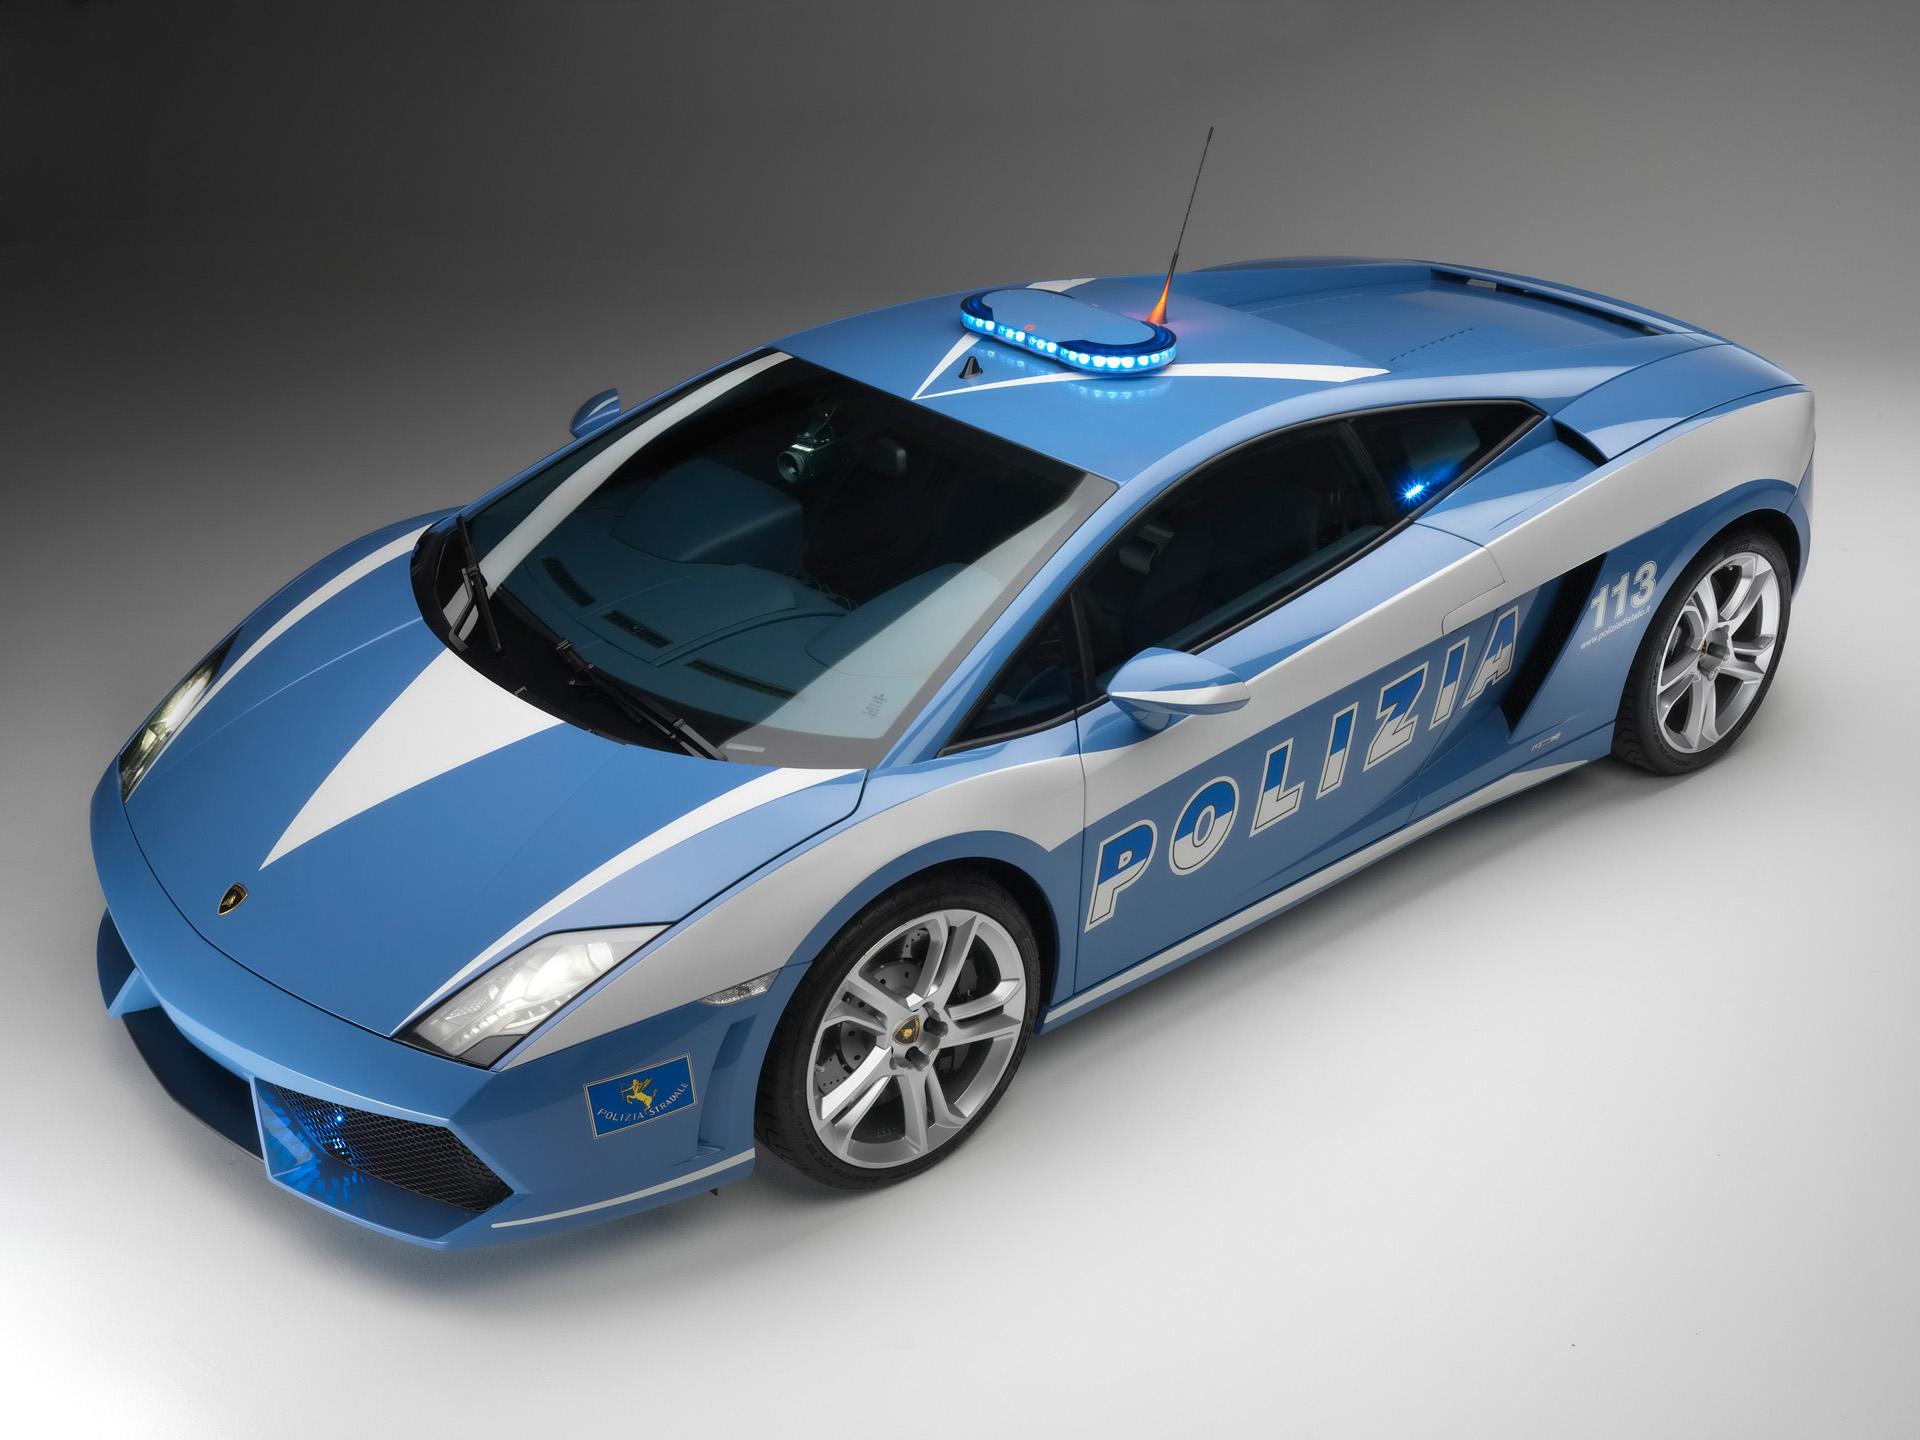 HD Wallpapers Lamborghini Gallardo Polizia